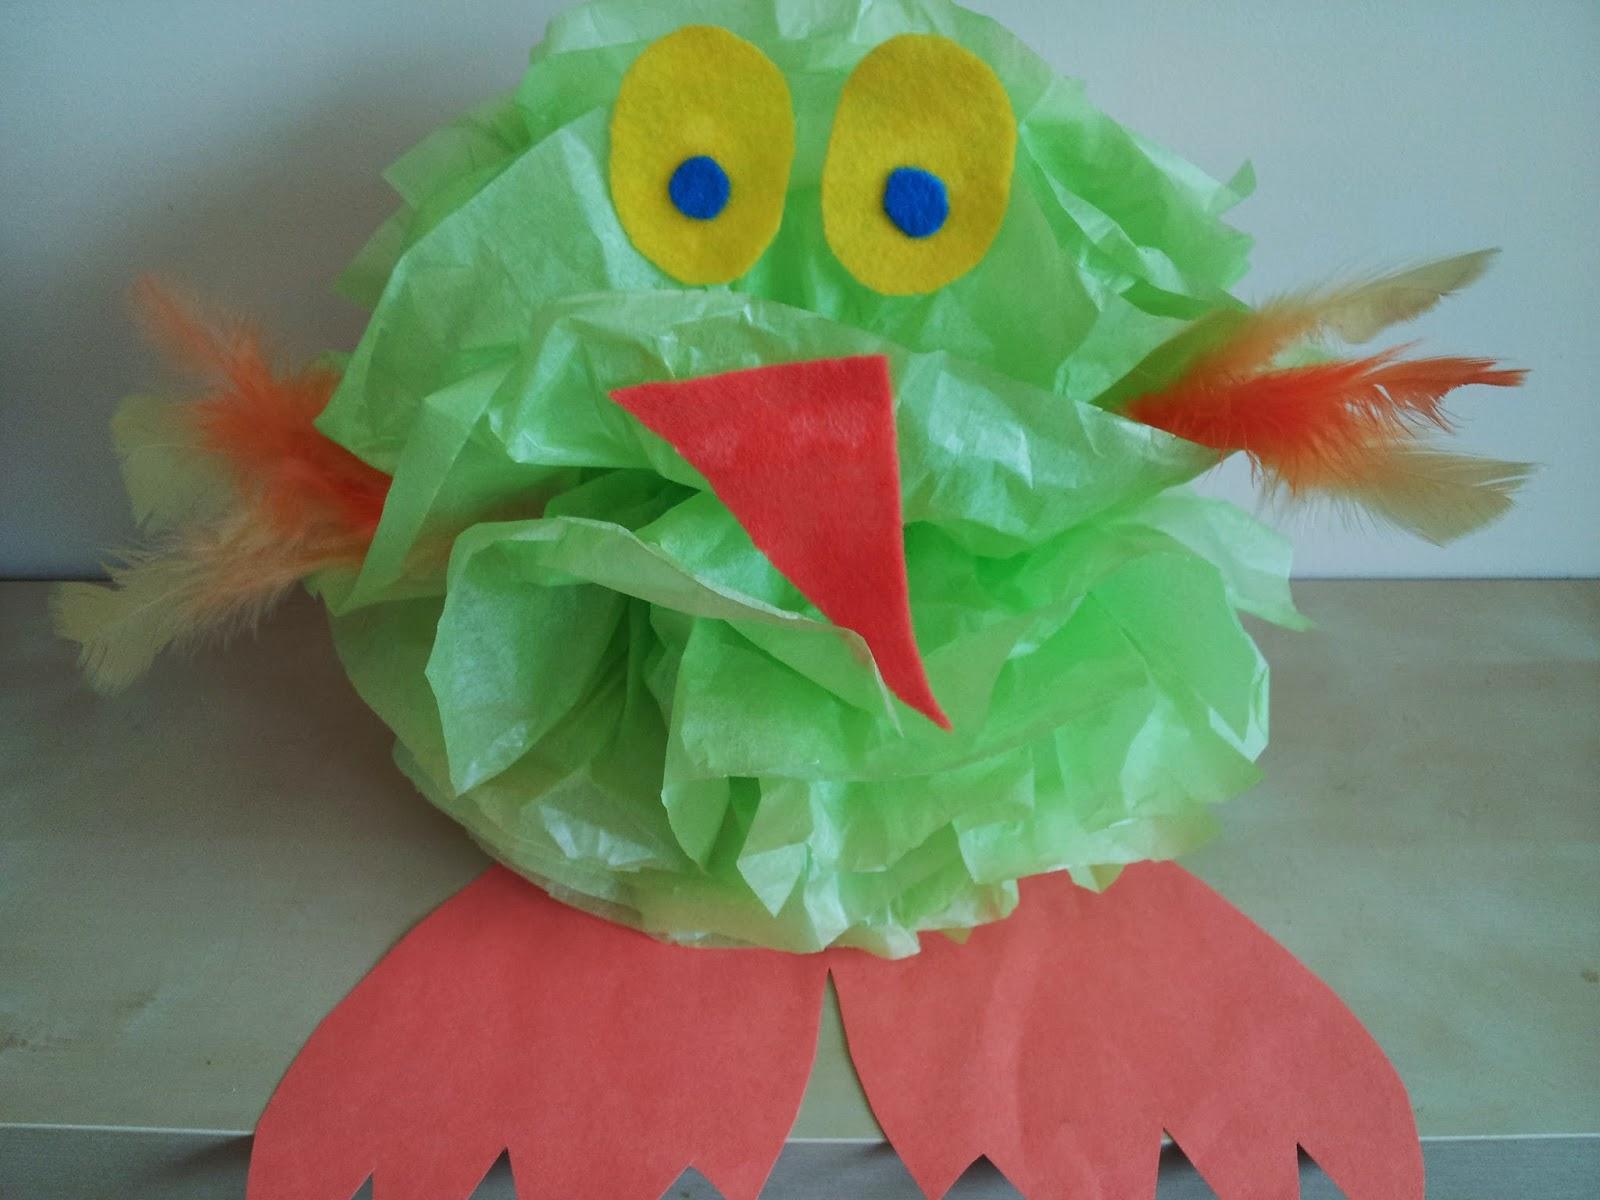 Easter chick craft, tissue paper crafts, kids crafts